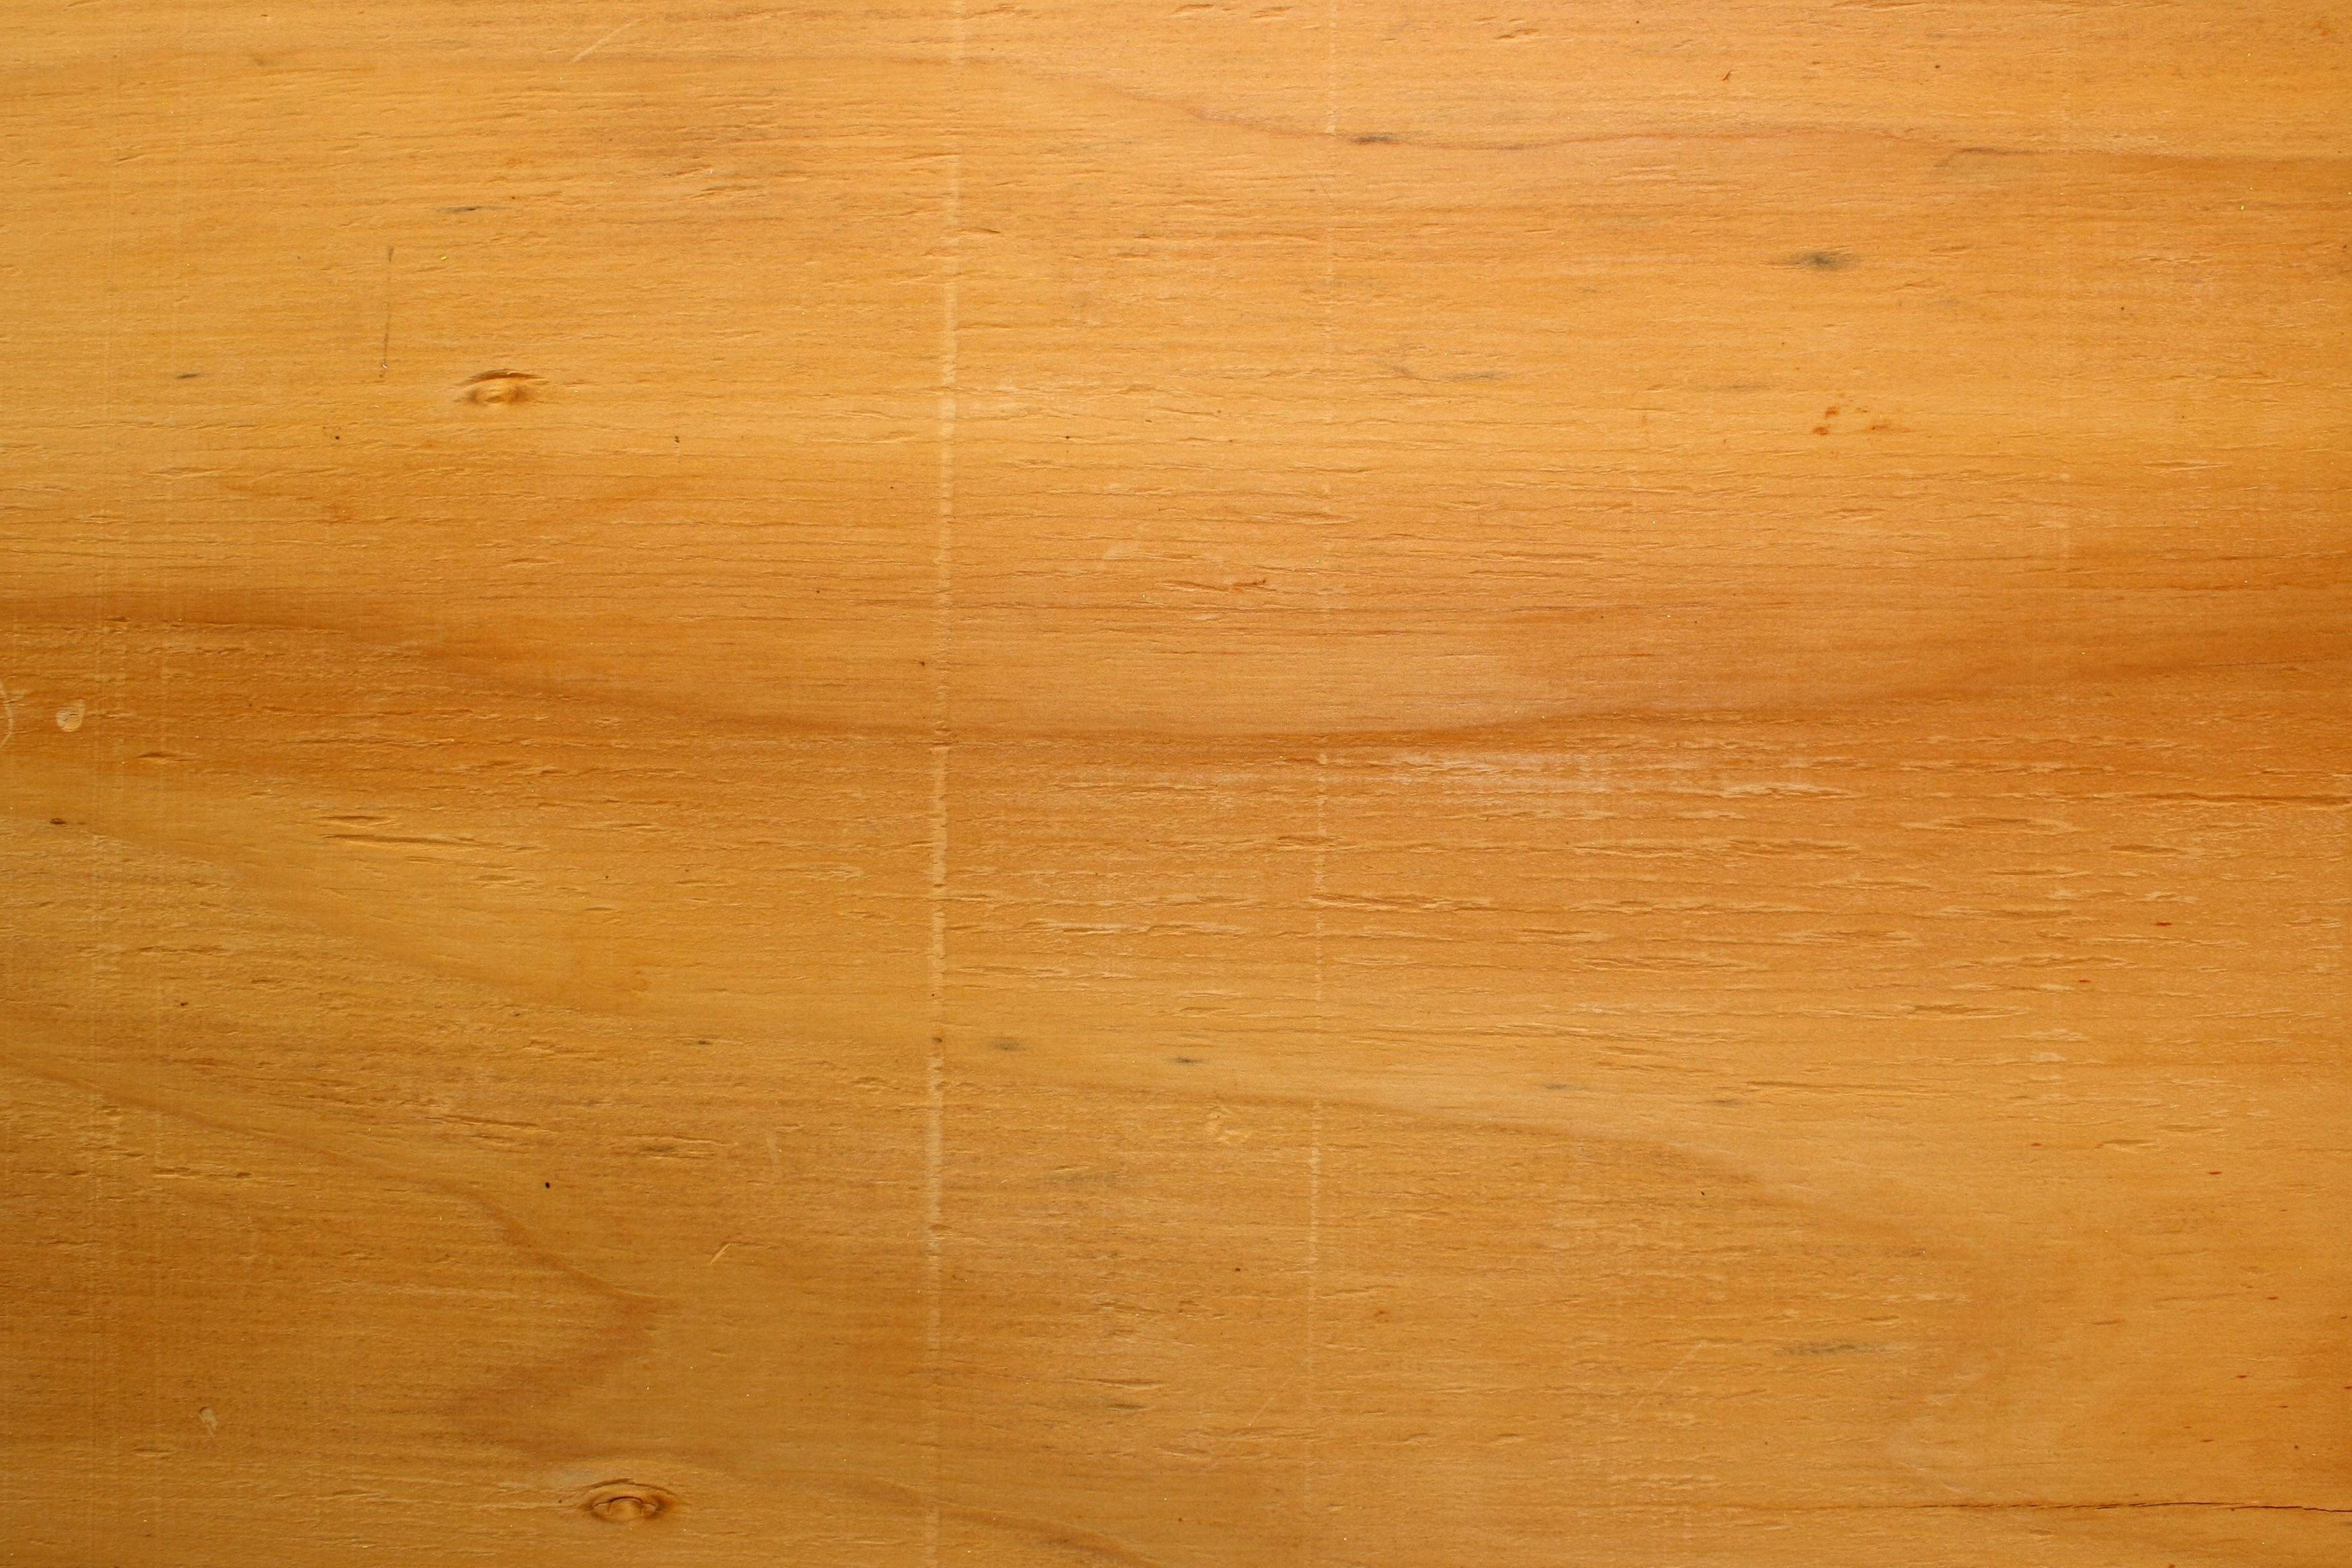 wood desk top view - photo #14